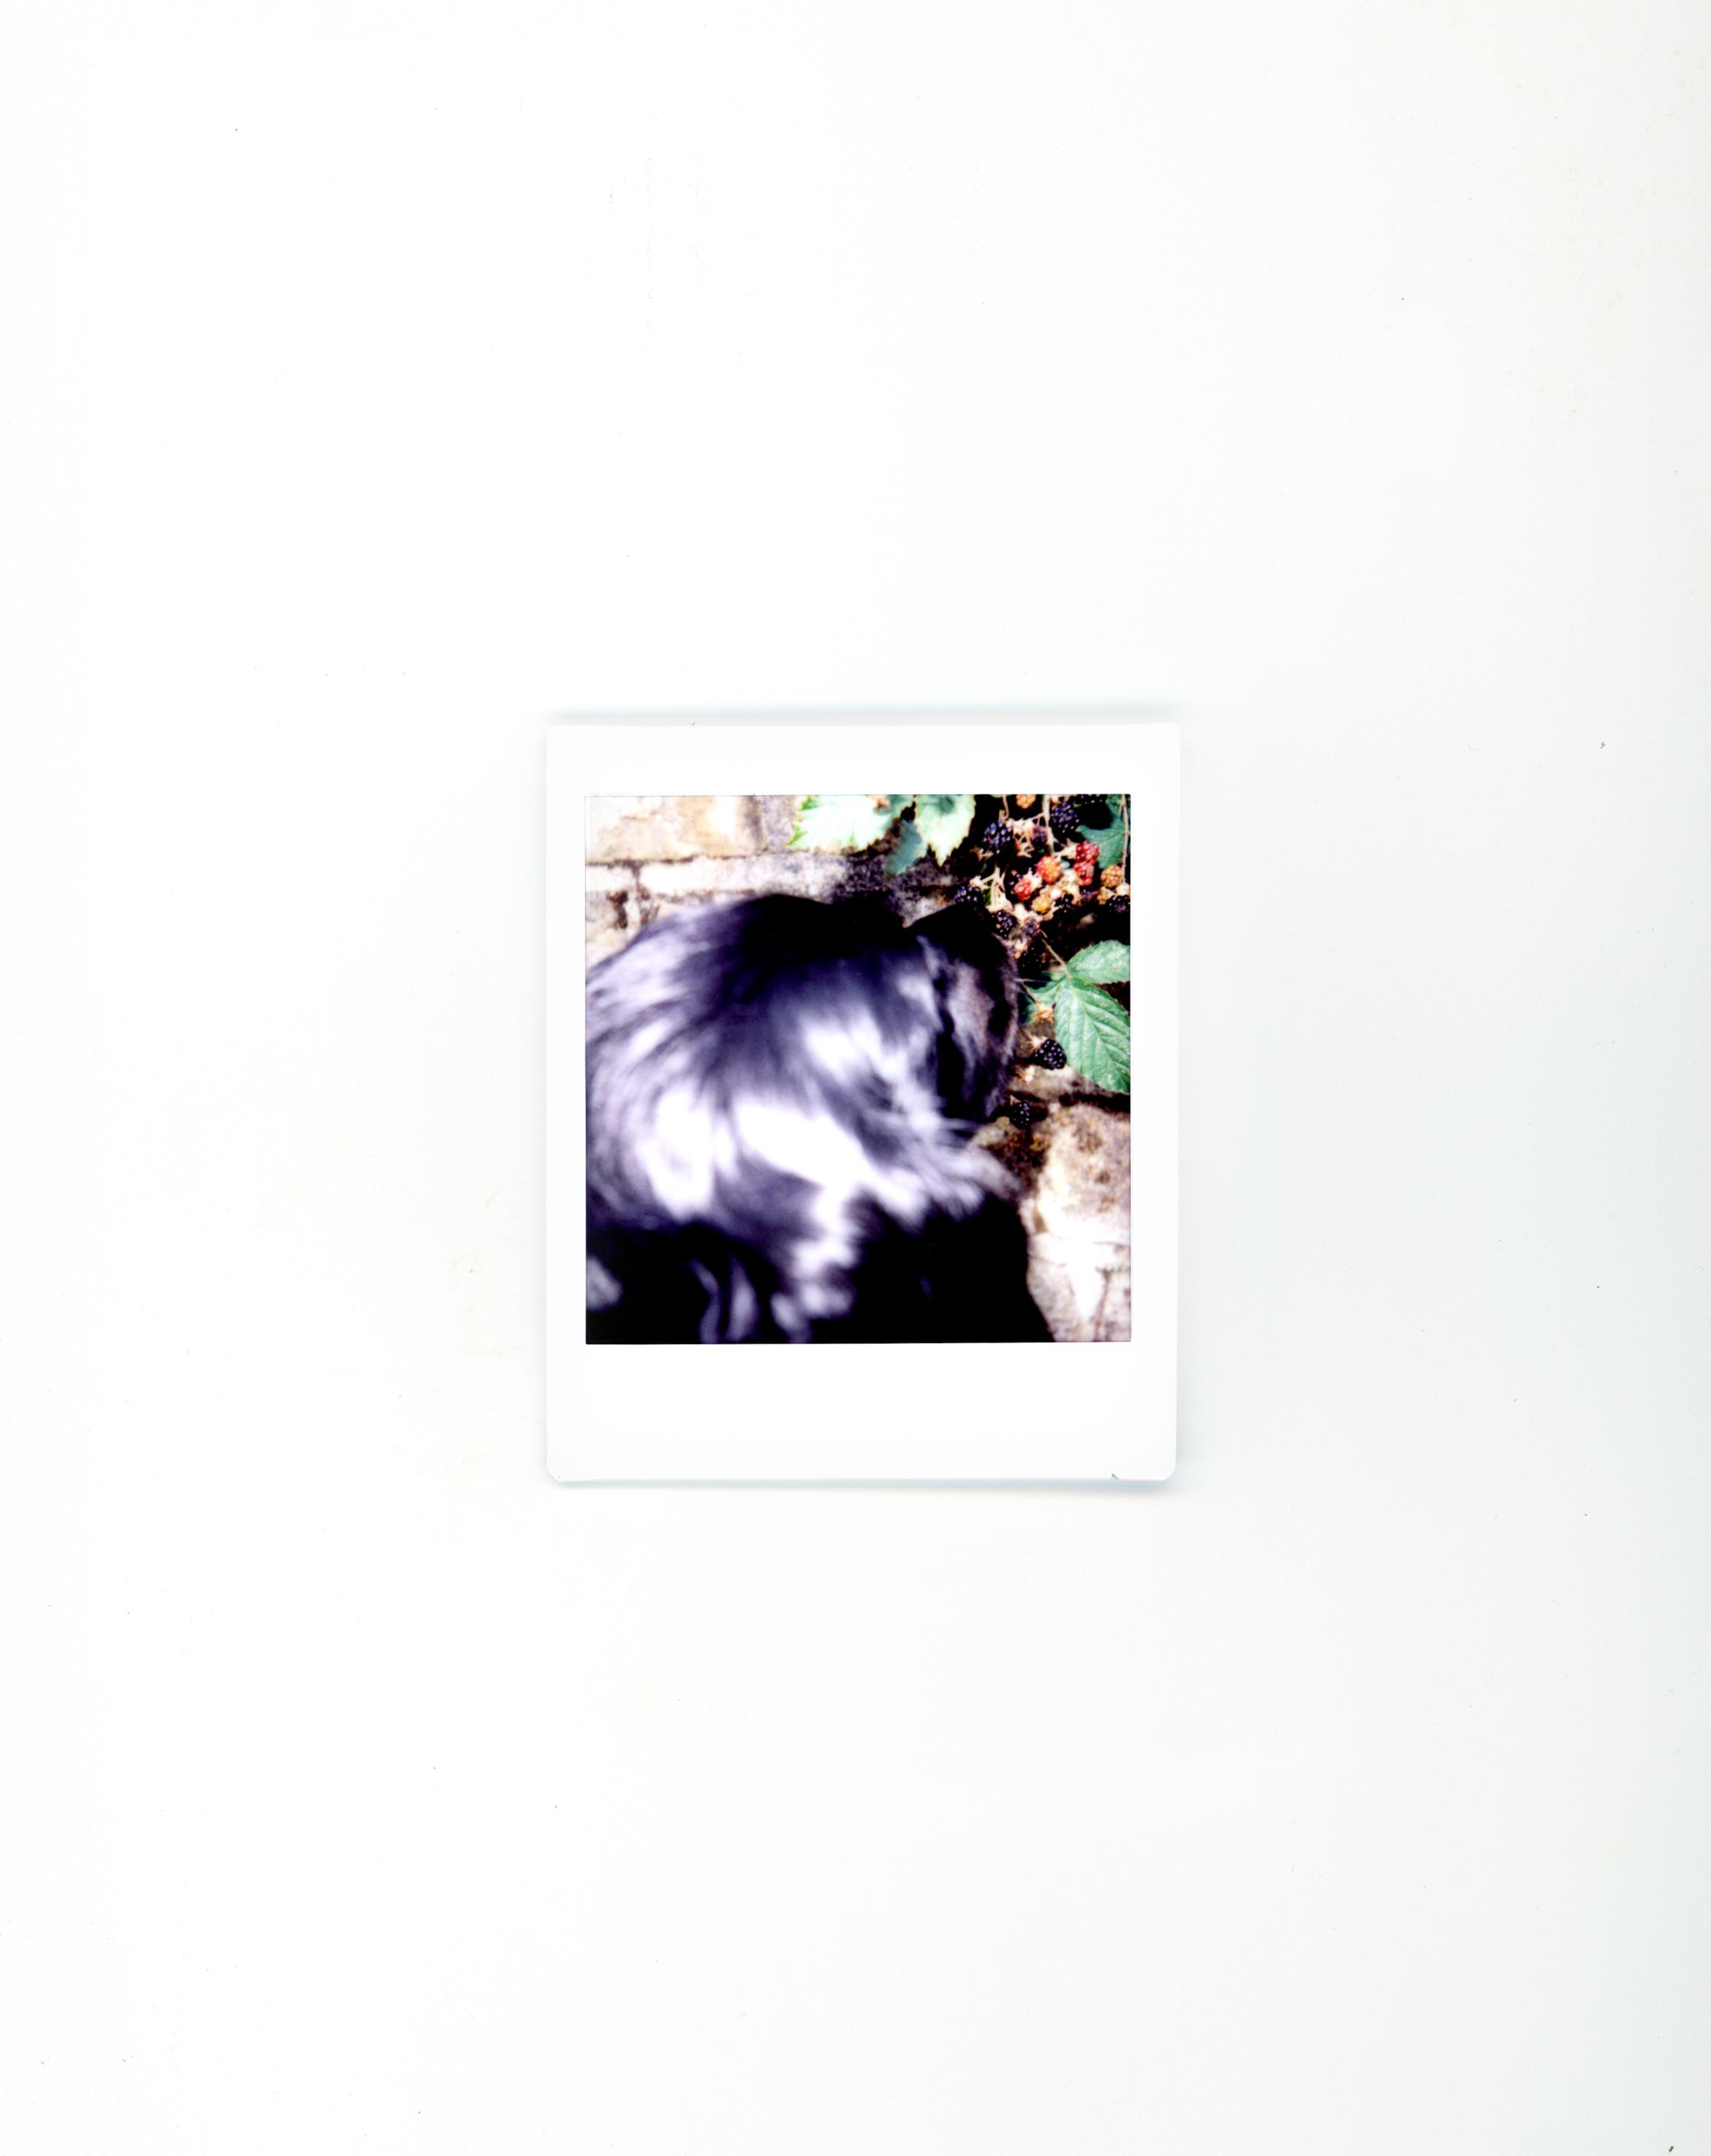 polaroids-13.jpg